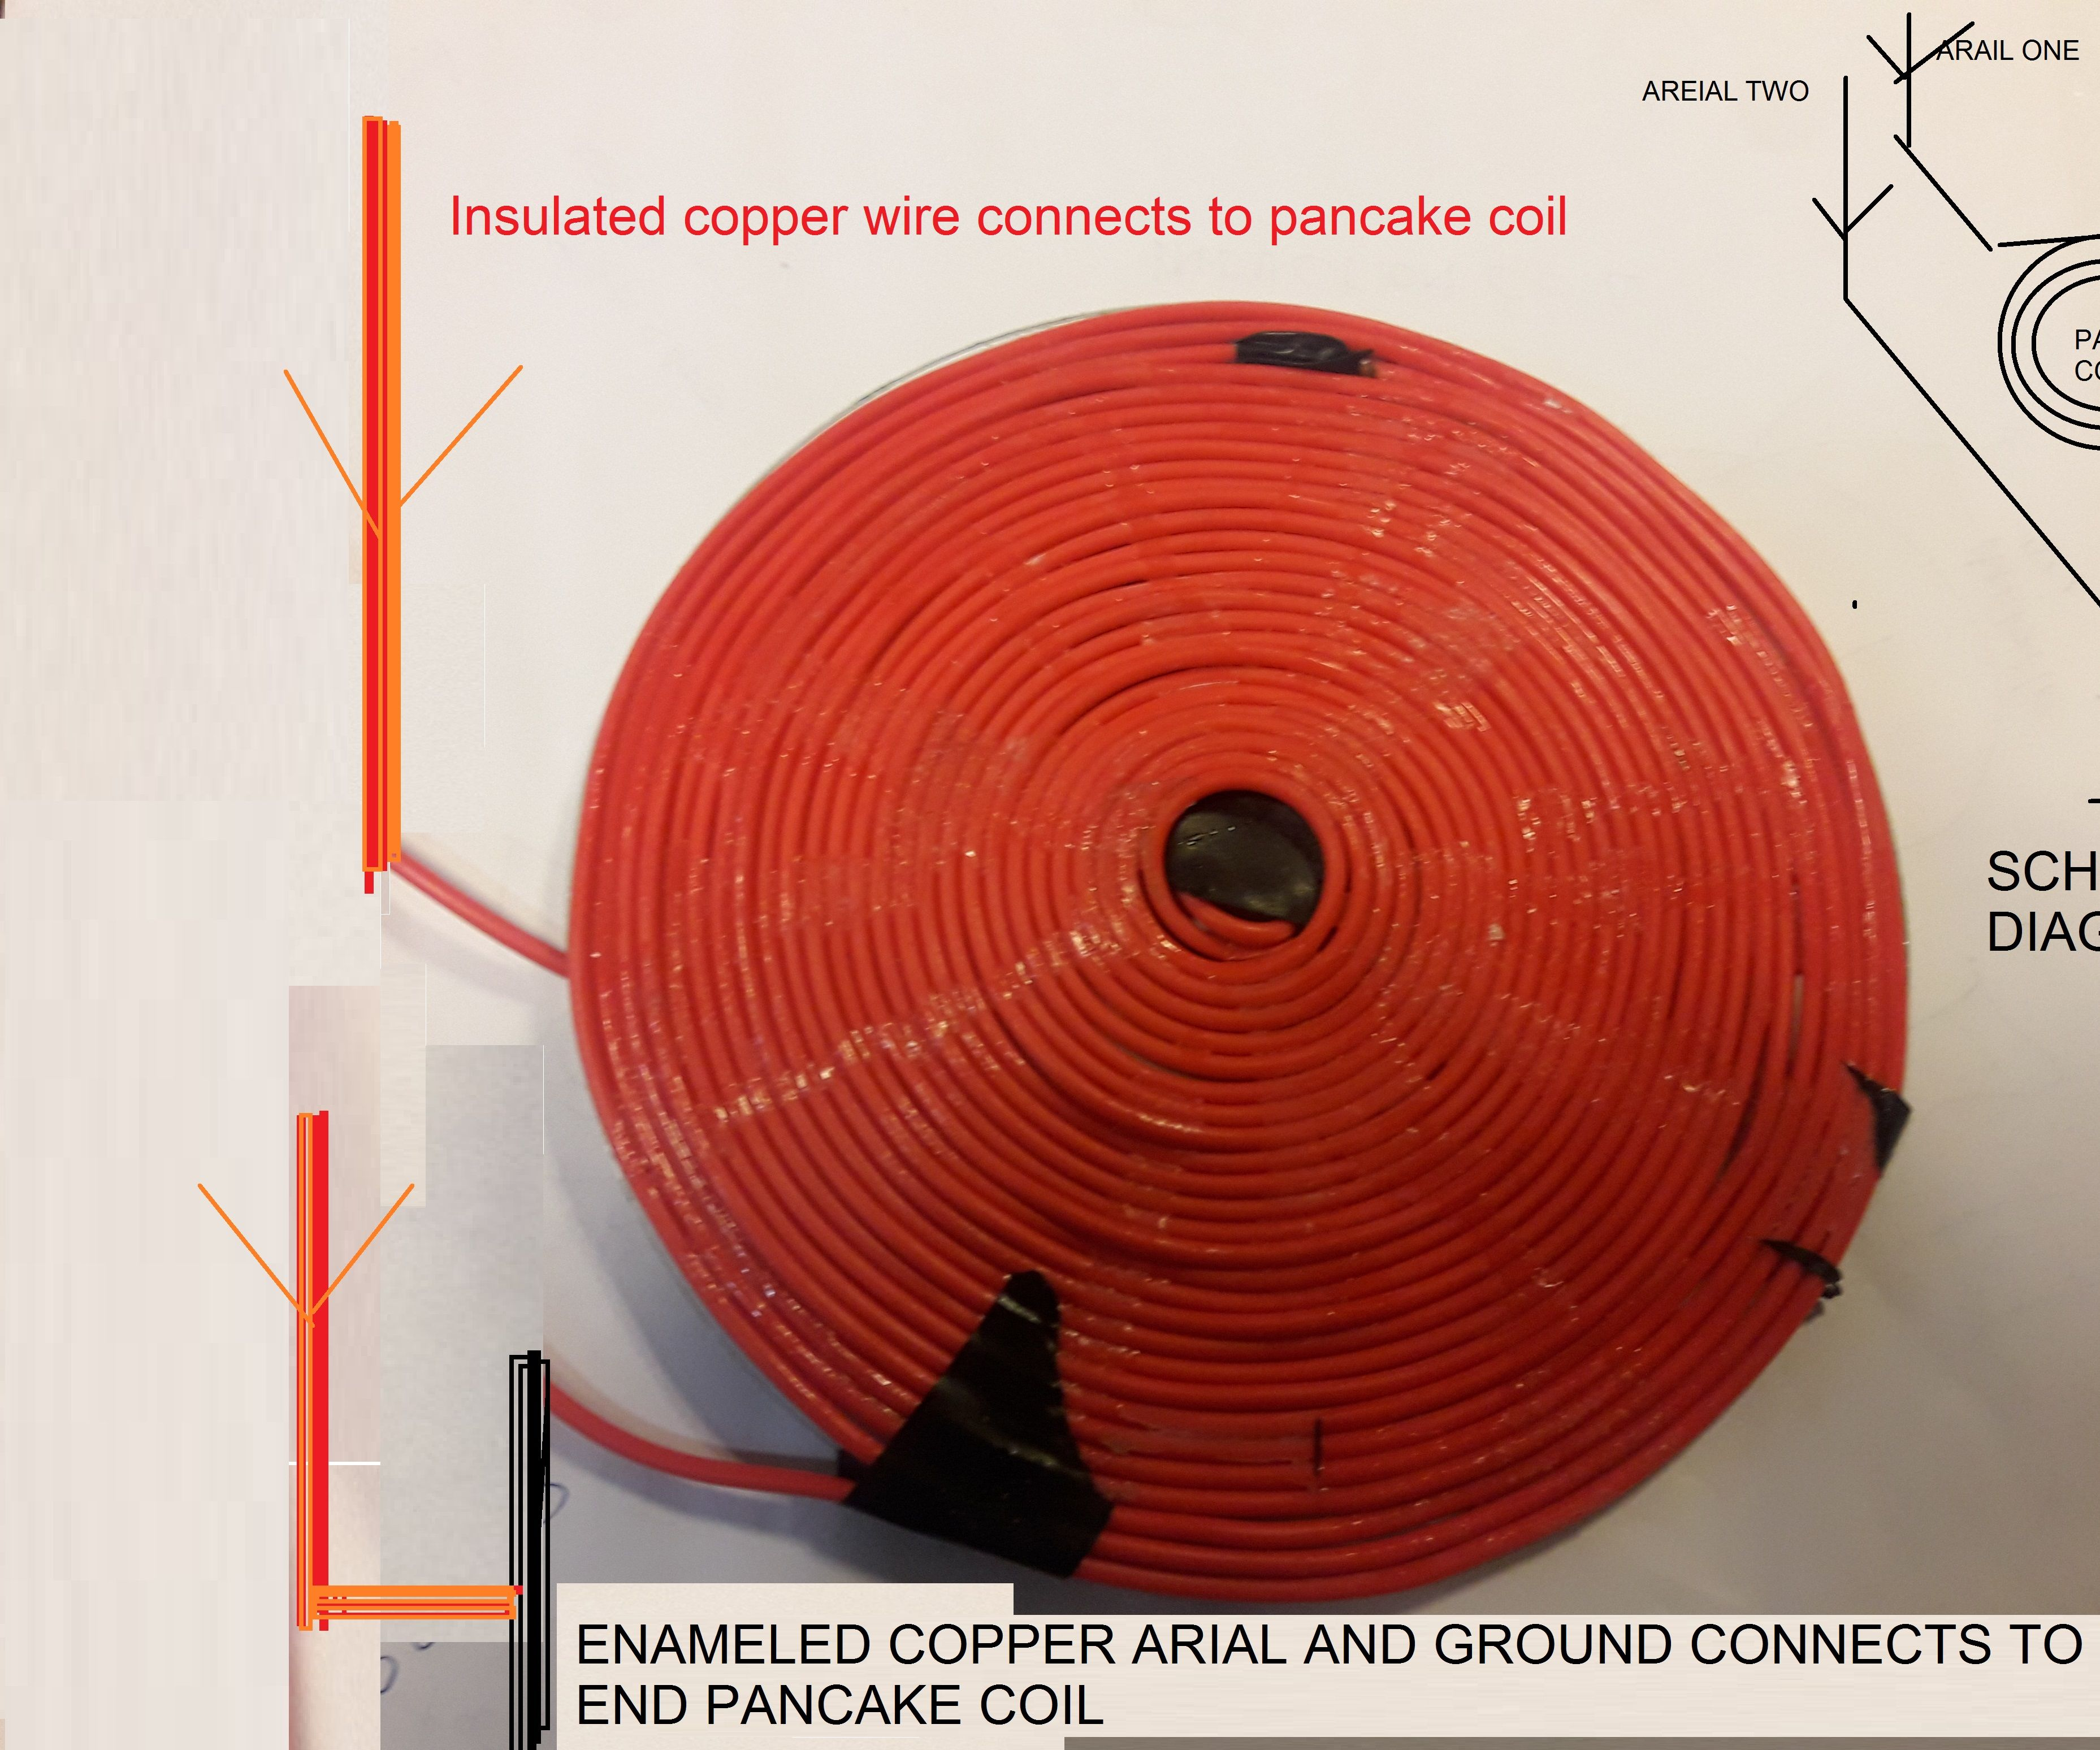 DIY Wireless Power From Medium Wave Radio